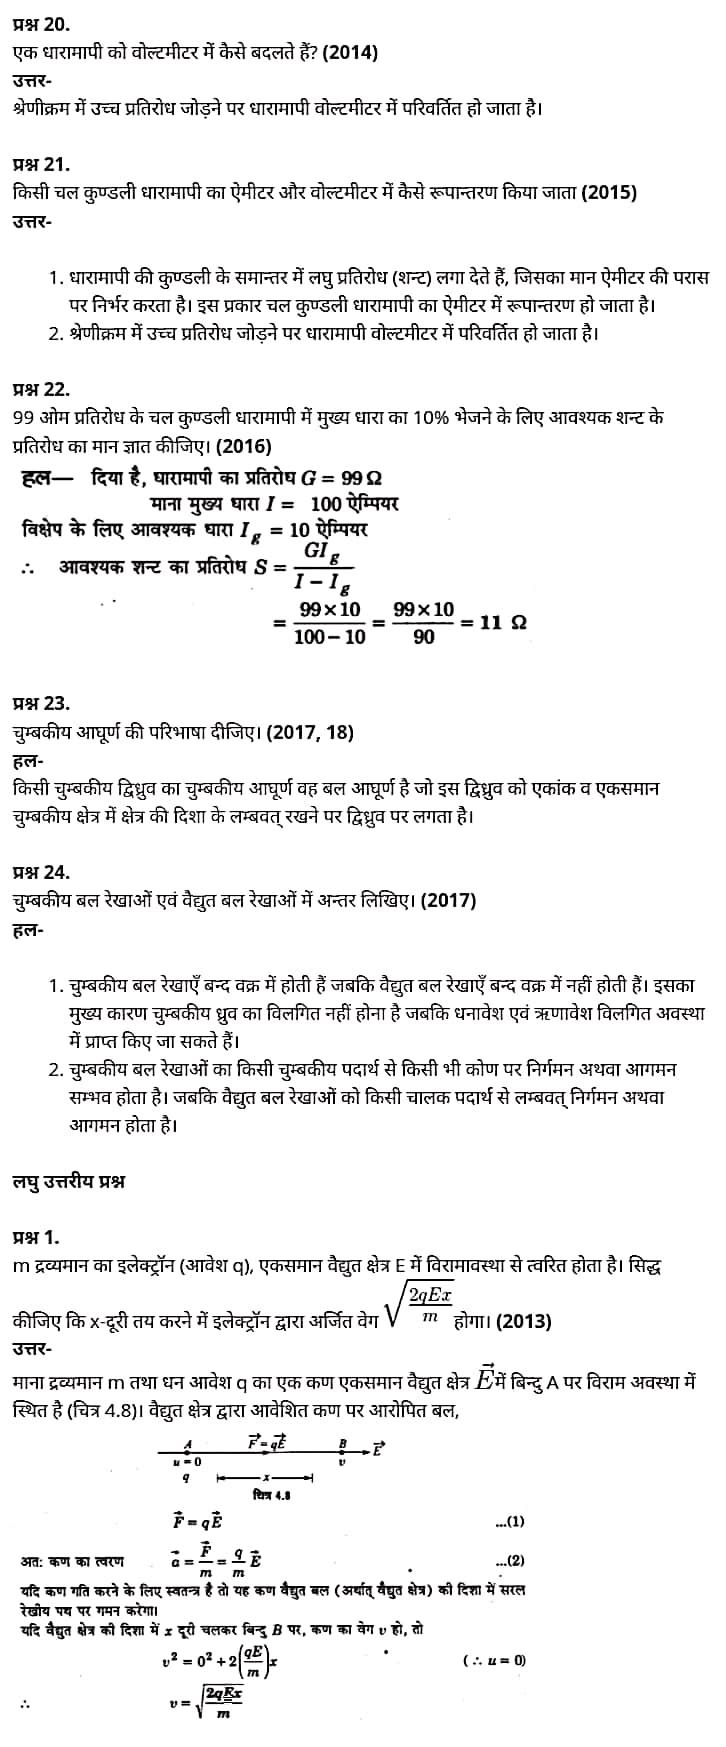 """Class 12 Physics Chapter 4"", ""Moving Charges and Magnetism"", ""(गतिमान आवेश और चुम्बकत्व)"", Hindi Medium भौतिक विज्ञान कक्षा 12 नोट्स pdf,  भौतिक विज्ञान कक्षा 12 नोट्स 2021 NCERT,  भौतिक विज्ञान कक्षा 12 PDF,  भौतिक विज्ञान पुस्तक,  भौतिक विज्ञान की बुक,  भौतिक विज्ञान प्रश्नोत्तरी Class 12, 12 वीं भौतिक विज्ञान पुस्तक RBSE,  बिहार बोर्ड 12 वीं भौतिक विज्ञान नोट्स,   12th Physics book in hindi,12th Physics notes in hindi,cbse books for class 12,cbse books in hindi,cbse ncert books,class 12 Physics notes in hindi,class 12 hindi ncert solutions,Physics 2020,Physics 2021,Maths 2022,Physics book class 12,Physics book in hindi,Physics class 12 in hindi,Physics notes for class 12 up board in hindi,ncert all books,ncert app in hindi,ncert book solution,ncert books class 10,ncert books class 12,ncert books for class 7,ncert books for upsc in hindi,ncert books in hindi class 10,ncert books in hindi for class 12 Physics,ncert books in hindi for class 6,ncert books in hindi pdf,ncert class 12 hindi book,ncert english book,ncert Physics book in hindi,ncert Physics books in hindi pdf,ncert Physics class 12,ncert in hindi,old ncert books in hindi,online ncert books in hindi,up board 12th,up board 12th syllabus,up board class 10 hindi book,up board class 12 books,up board class 12 new syllabus,up Board Maths 2020,up Board Maths 2021,up Board Maths 2022,up Board Maths 2023,up board intermediate Physics syllabus,up board intermediate syllabus 2021,Up board Master 2021,up board model paper 2021,up board model paper all subject,up board new syllabus of class 12th Physics,up board paper 2021,Up board syllabus 2021,UP board syllabus 2022,  12 वीं भौतिक विज्ञान पुस्तक हिंदी में, 12 वीं भौतिक विज्ञान नोट्स हिंदी में, कक्षा 12 के लिए सीबीएससी पुस्तकें, हिंदी में सीबीएससी पुस्तकें, सीबीएससी  पुस्तकें, कक्षा 12 भौतिक विज्ञान नोट्स हिंदी में, कक्षा 12 हिंदी एनसीईआरटी समाधान, भौतिक विज्ञान 2020, भौतिक विज्ञान 2021, भौतिक विज्ञान 2022, भौतिक विज्ञान  बुक क्लास 12, भौतिक विज्ञान बुक इन हिंदी, ब"